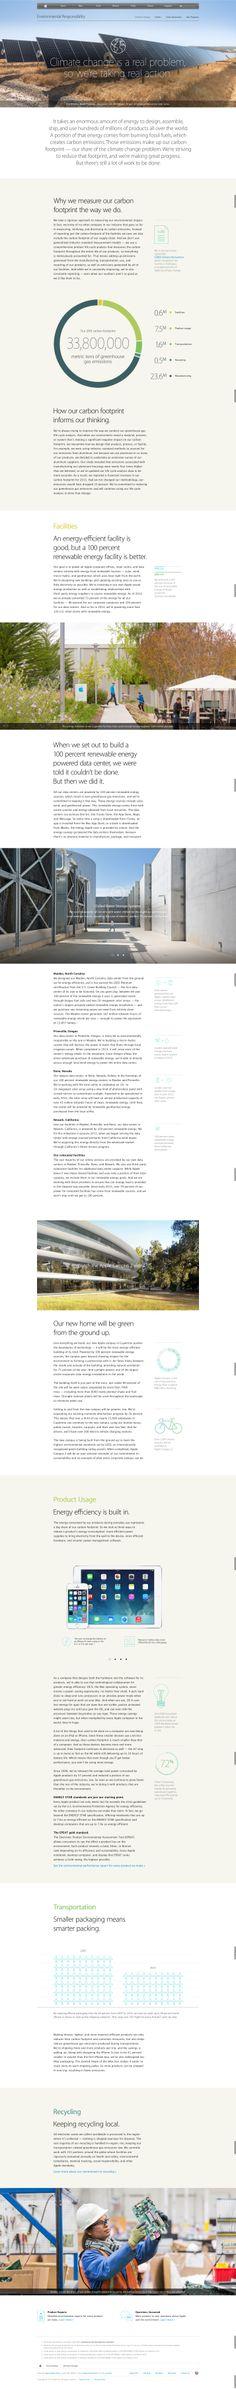 Apple company page